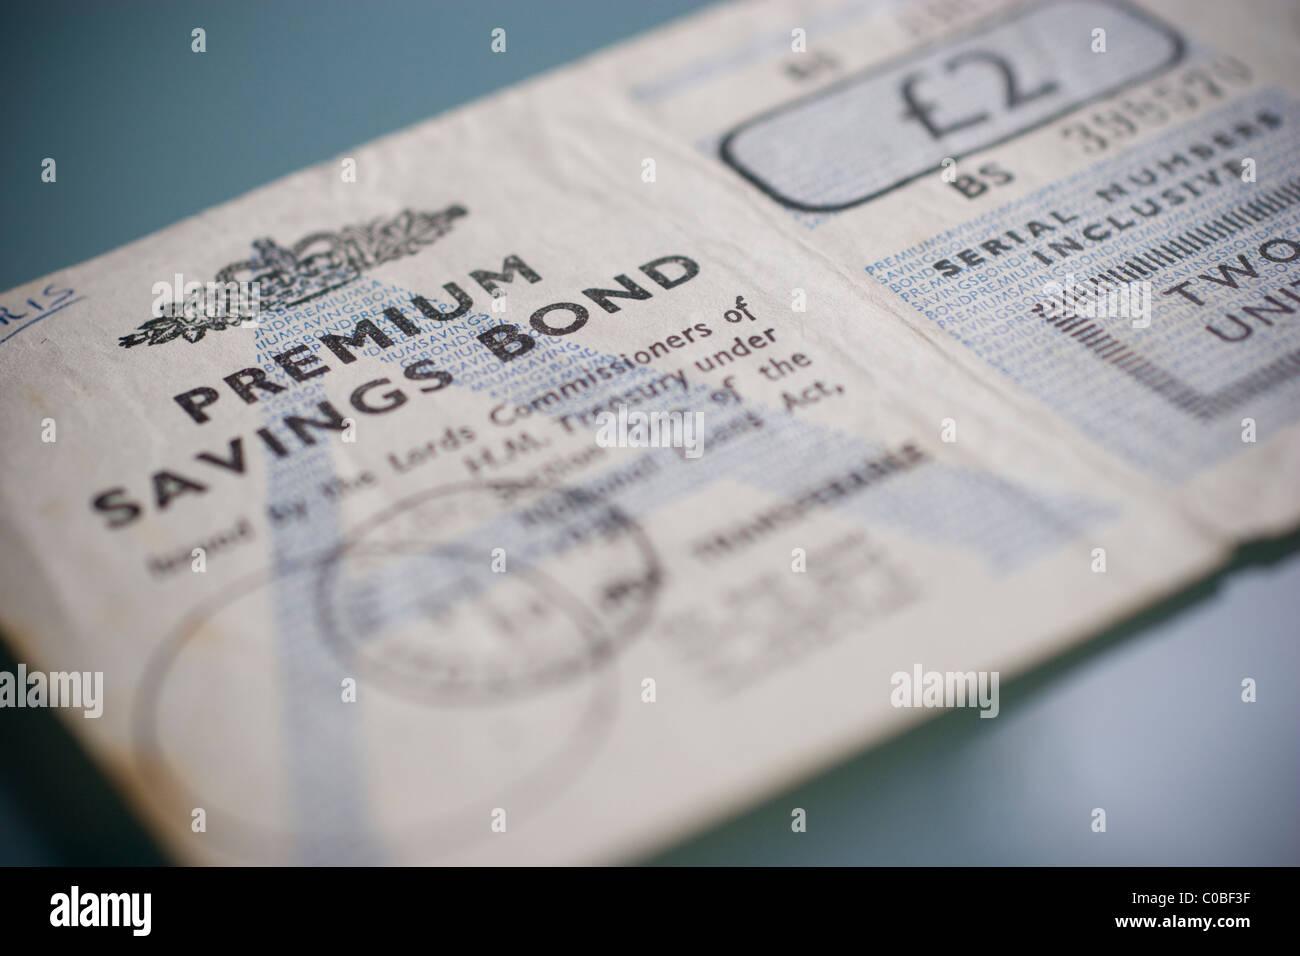 premium bonds uk application form